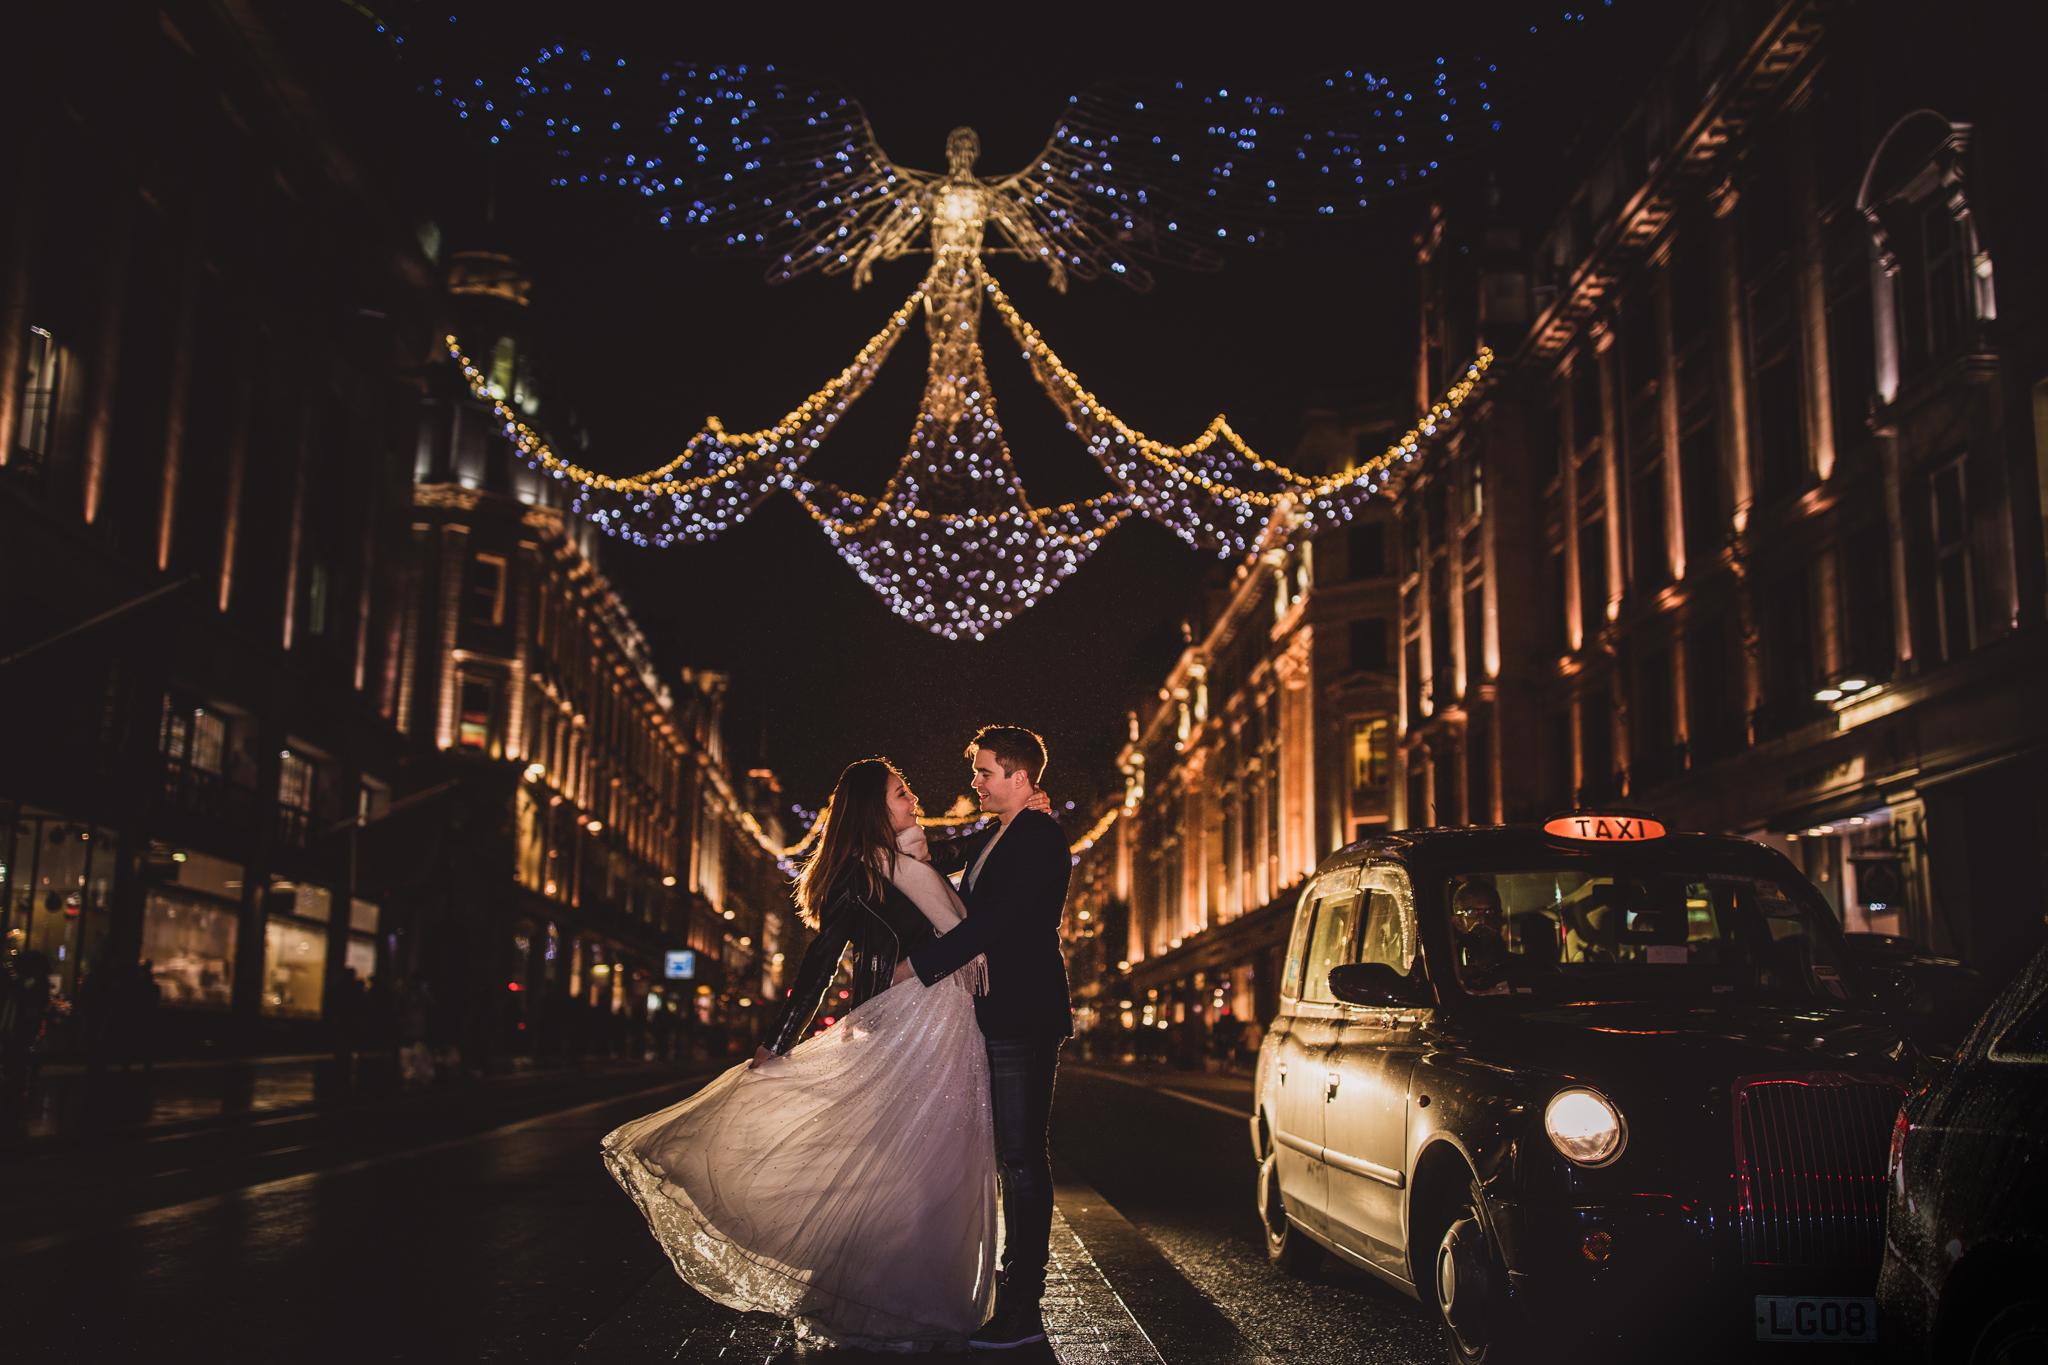 London Christmas: Francesca & Gavin Engagment Photoshoot